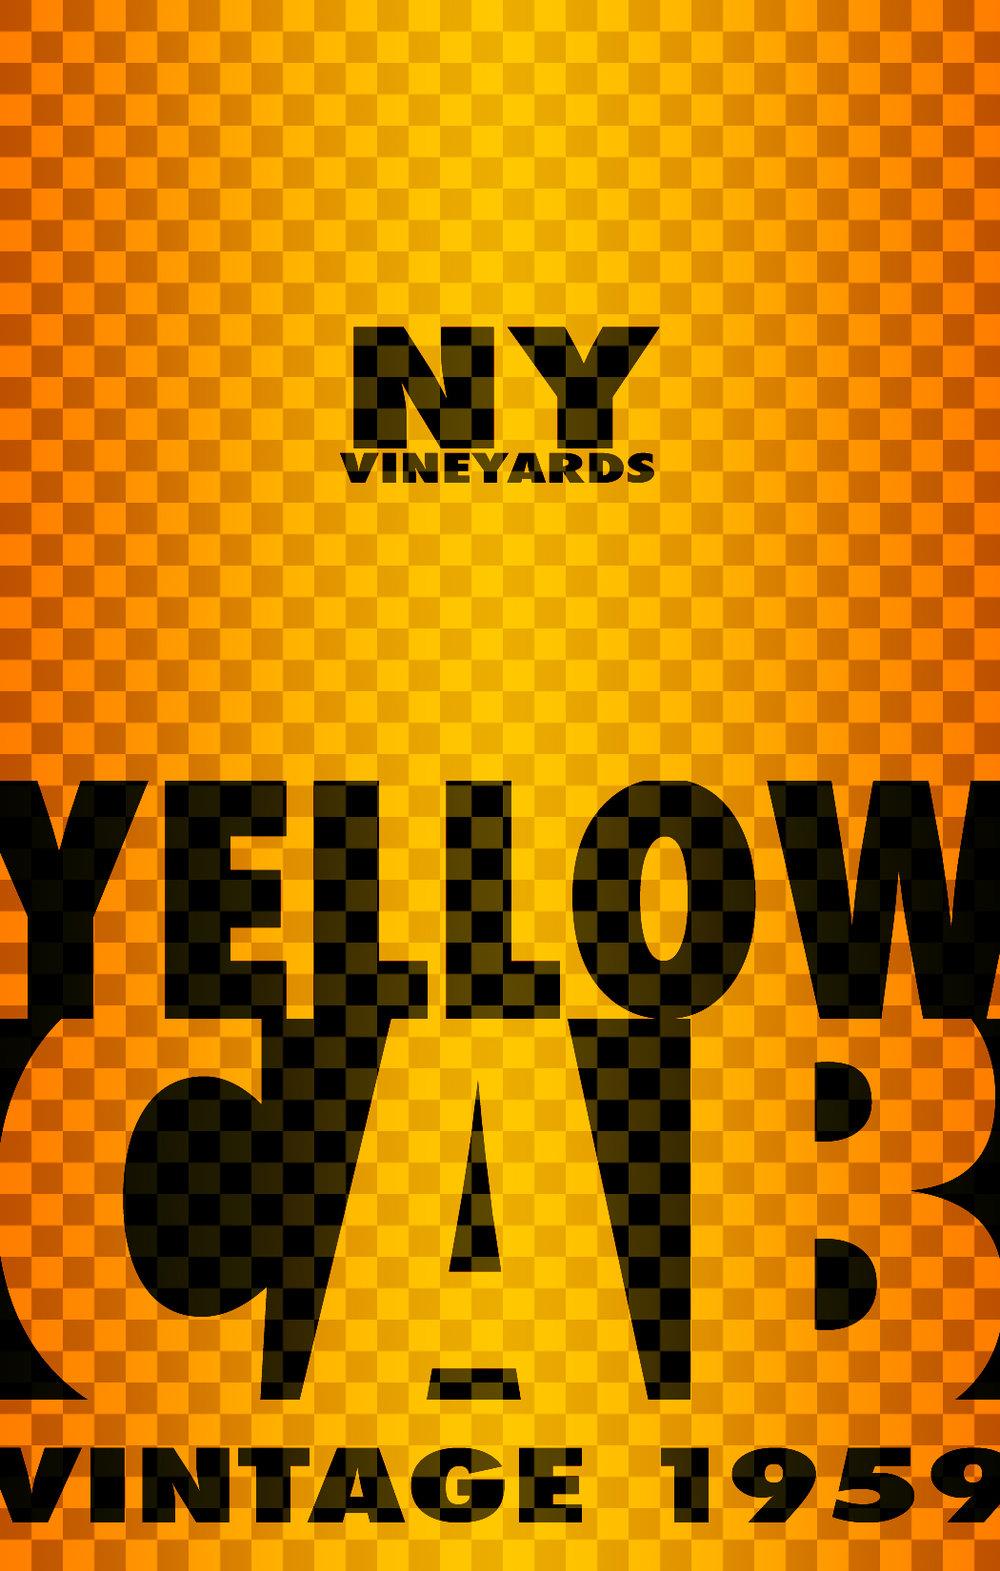 yellow cab front.jpg